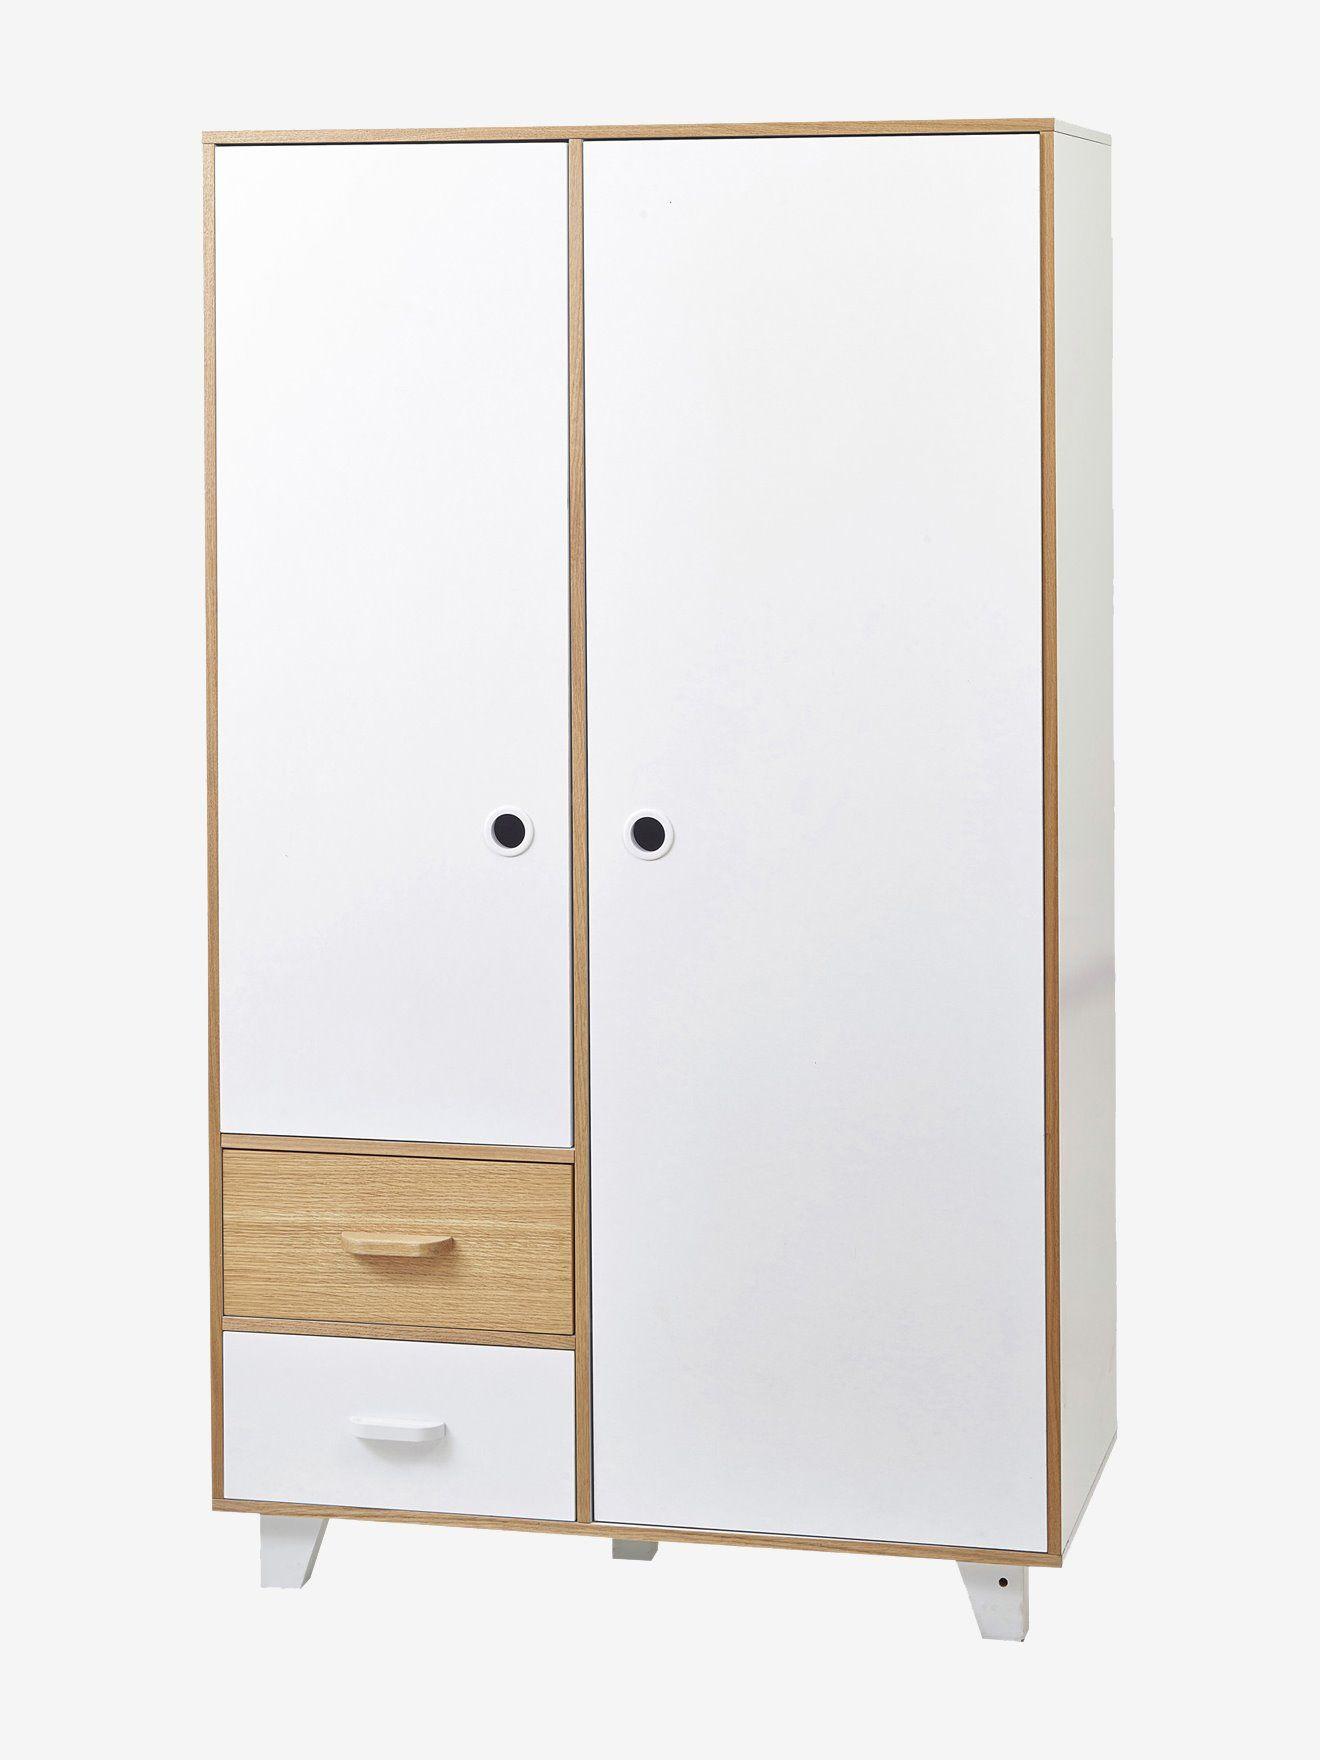 "Vertbaudet Kinder Kleiderschrank, 2 Türen ""Hopla"" in"